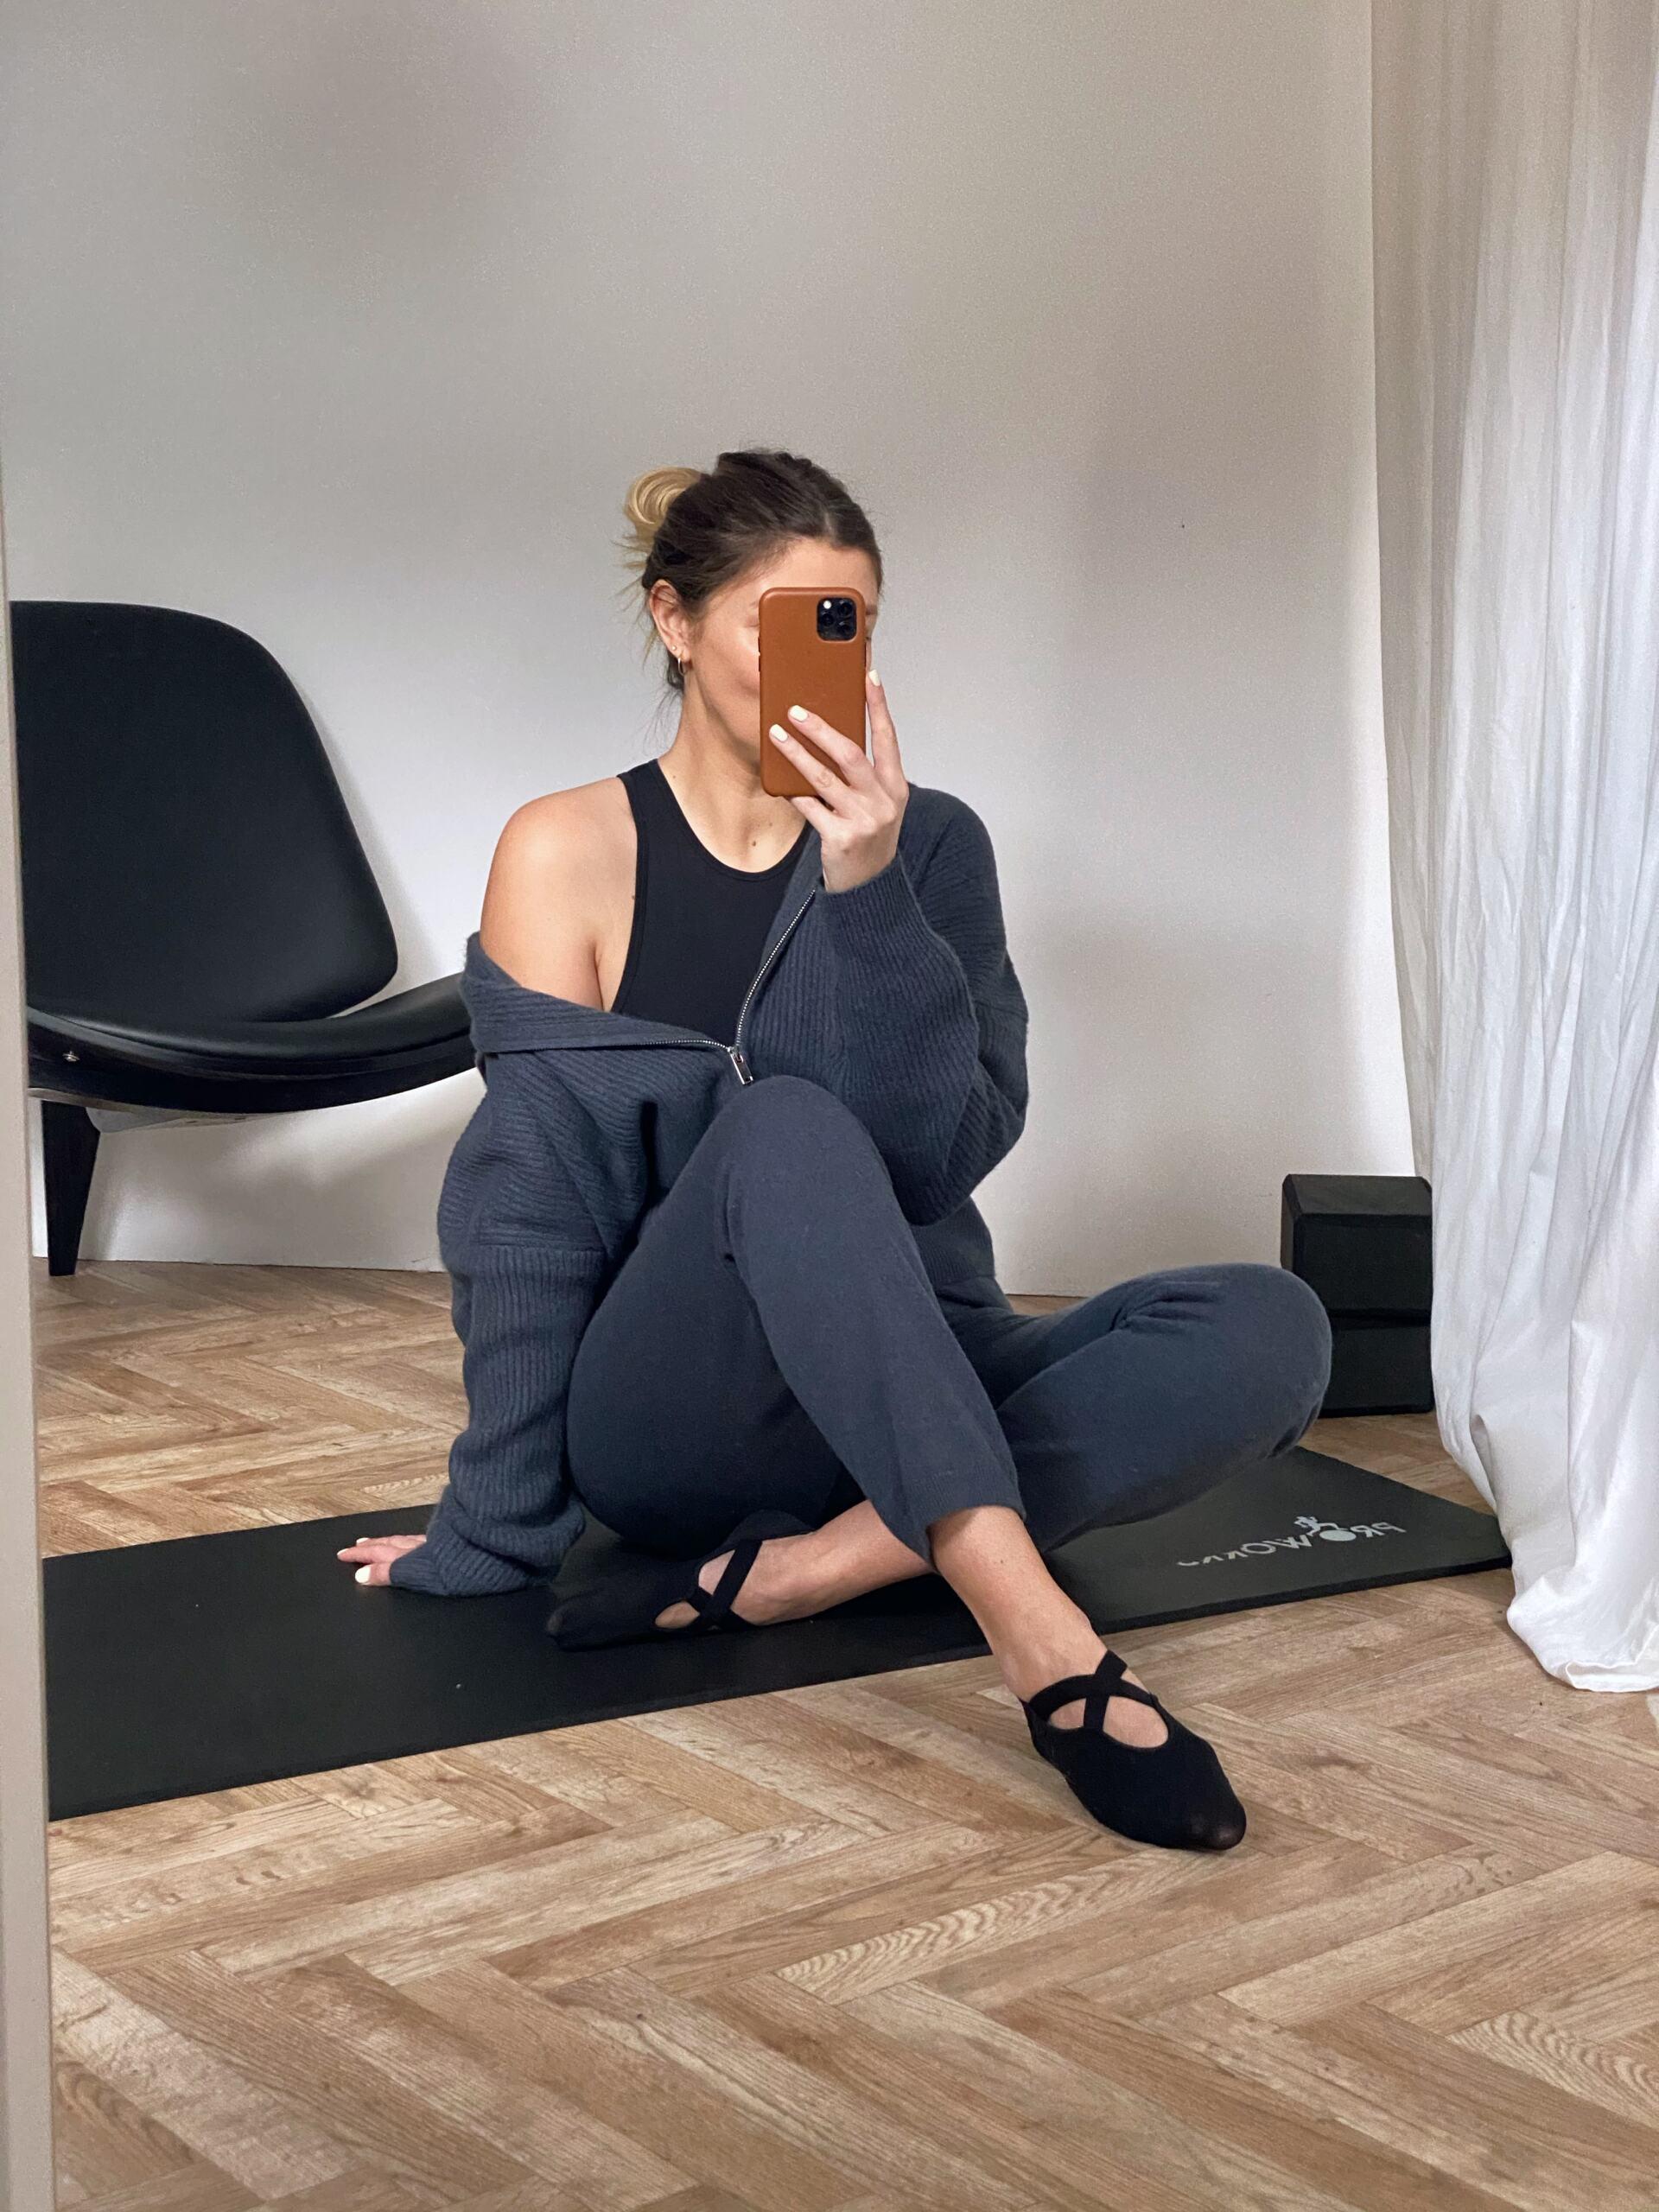 Yoga in cashmere